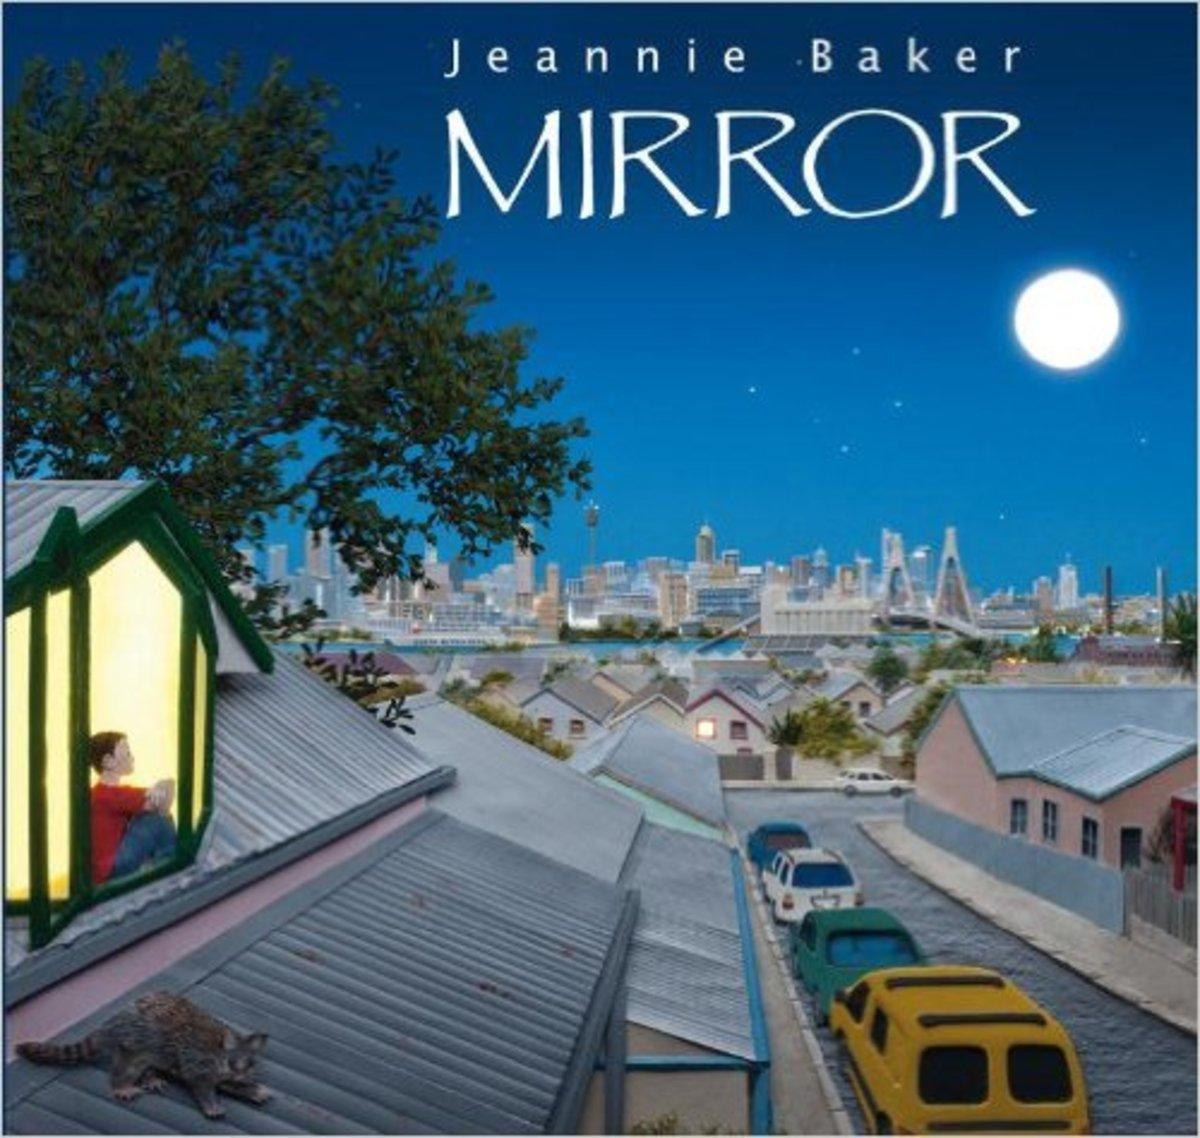 Mirror by Jeannie Baker